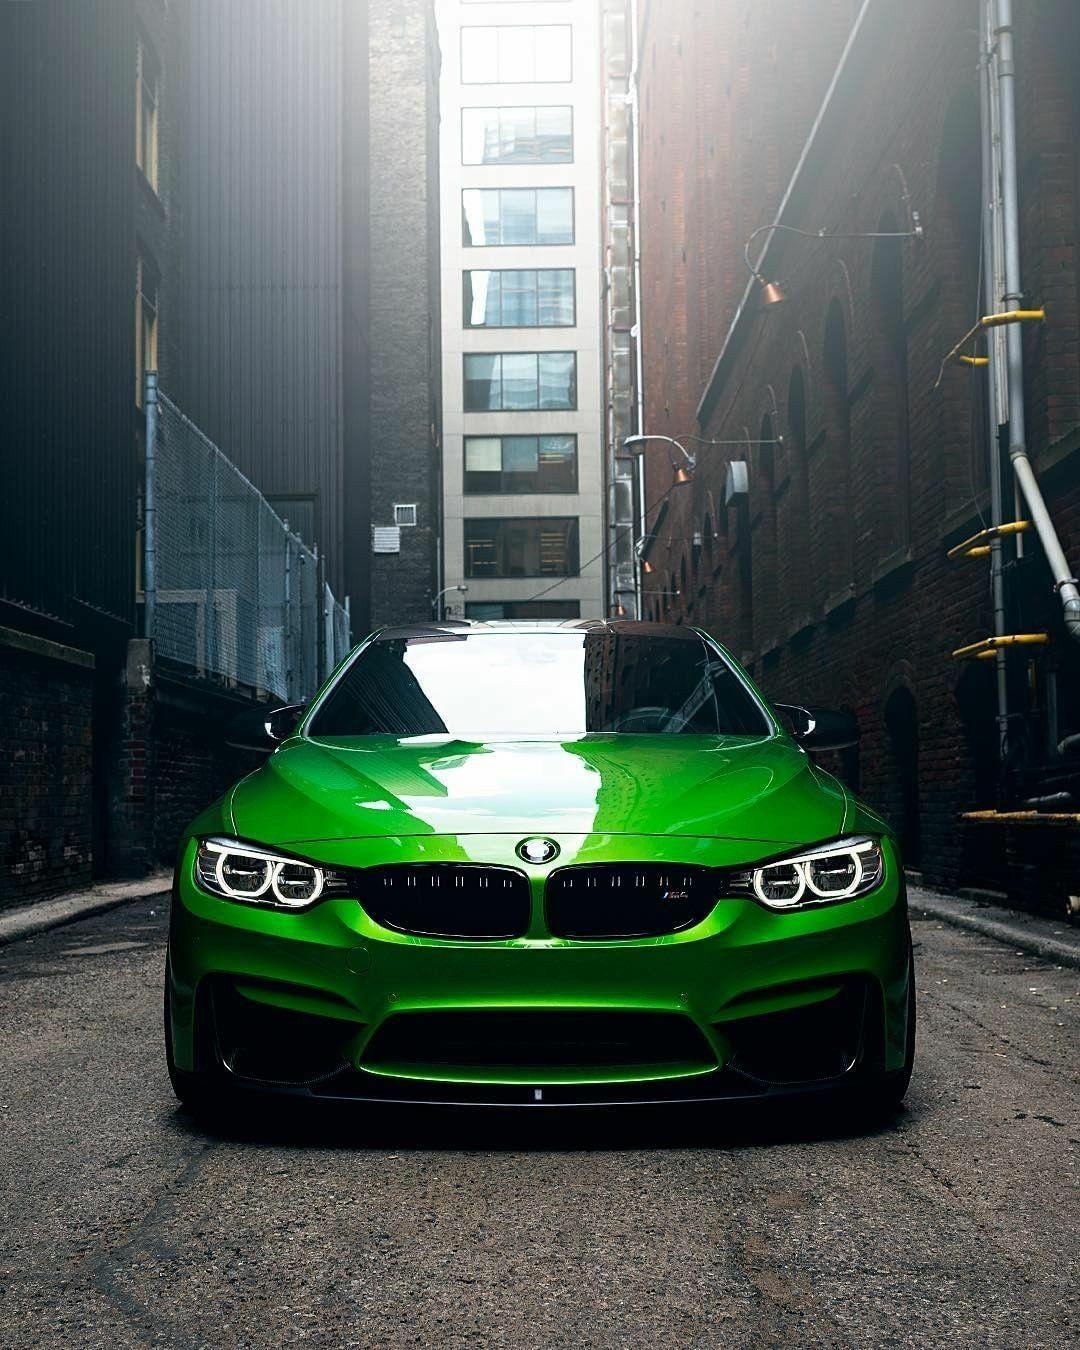 Green Bmw M4 Coupe Hd Wallpaper Voiture De Luxe Pinterest Bmw